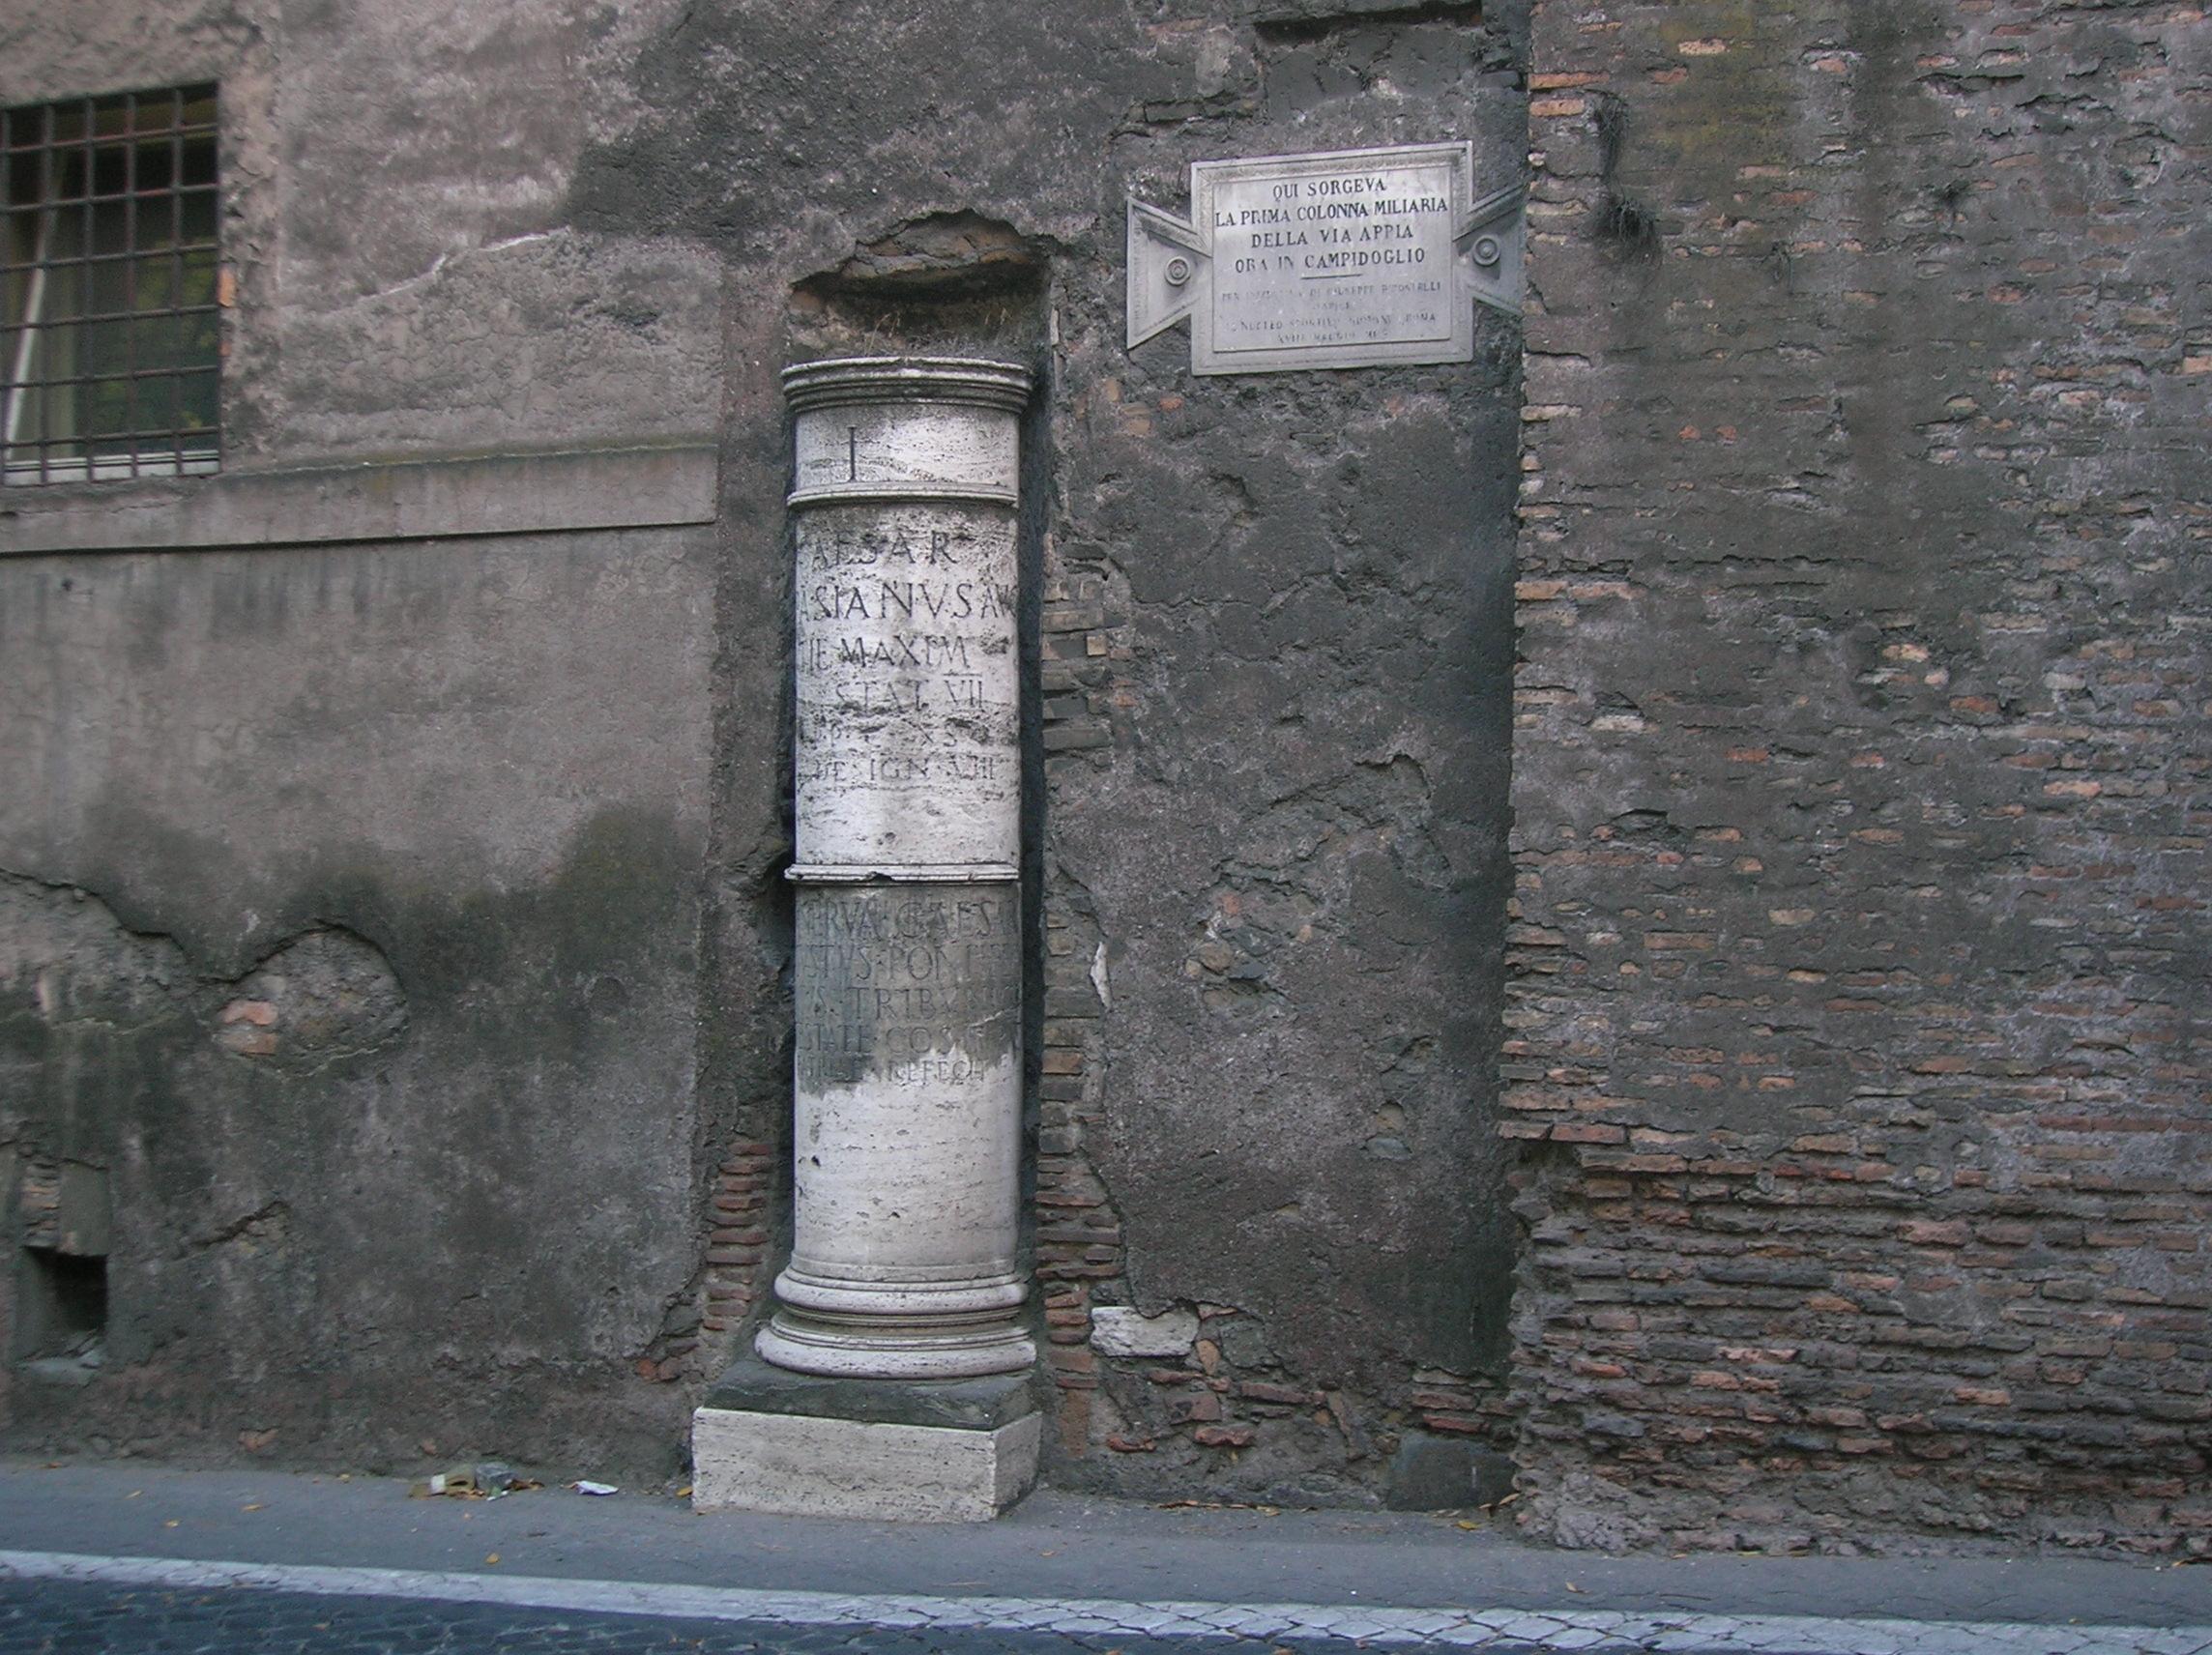 Appia_antica_2-7-05_007.jpg